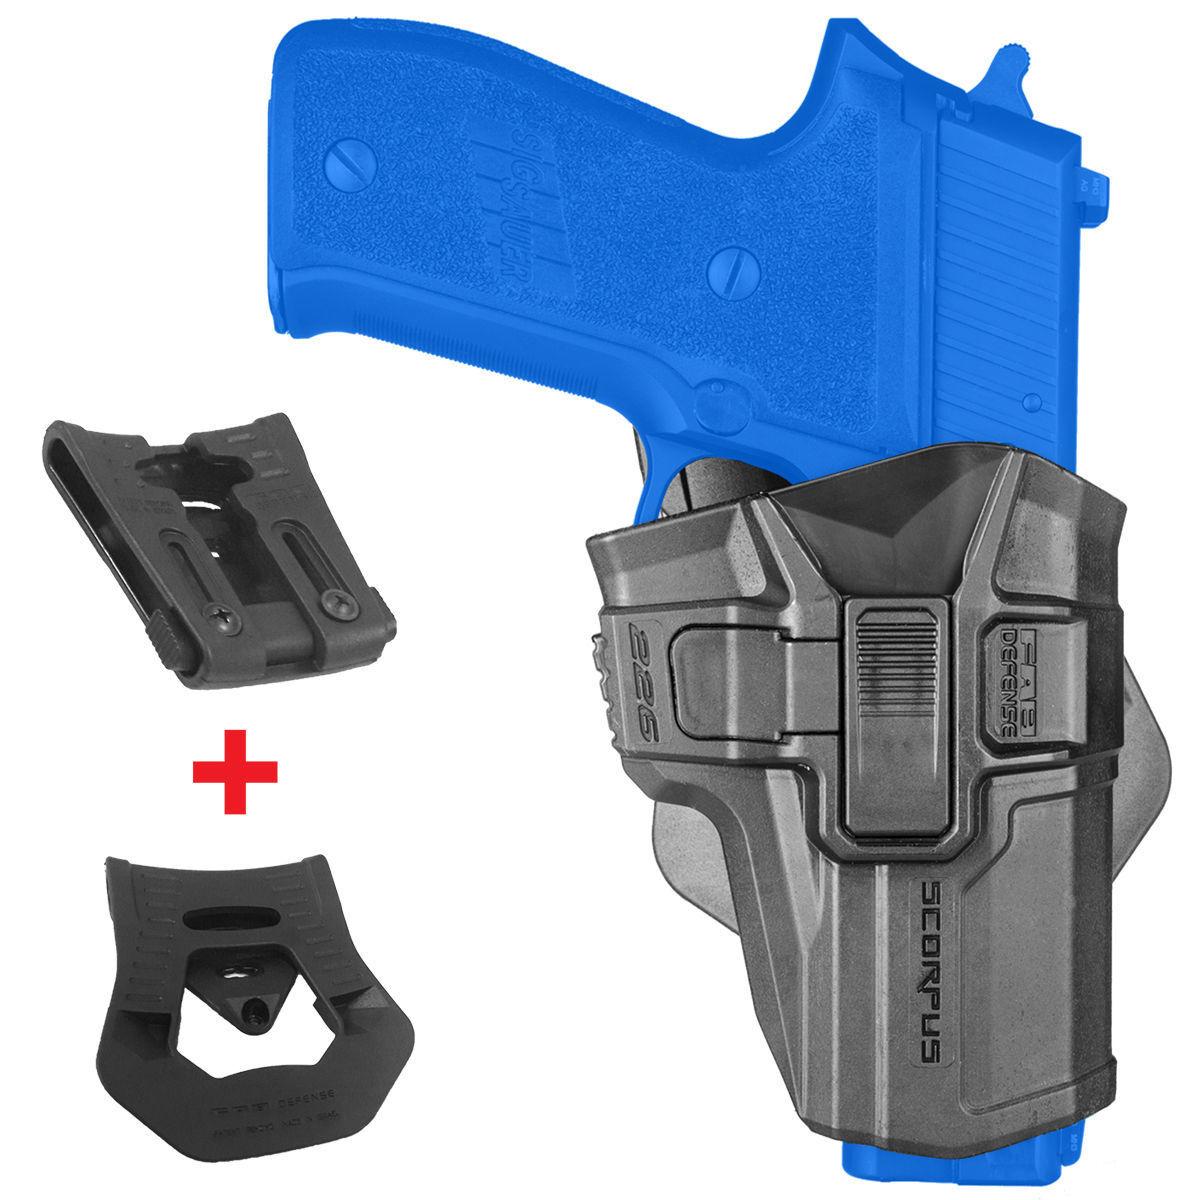 FAB Defense SCORPUS Level 2 RETENTION HOLSTER for SIG SAUER P226 Models 226R